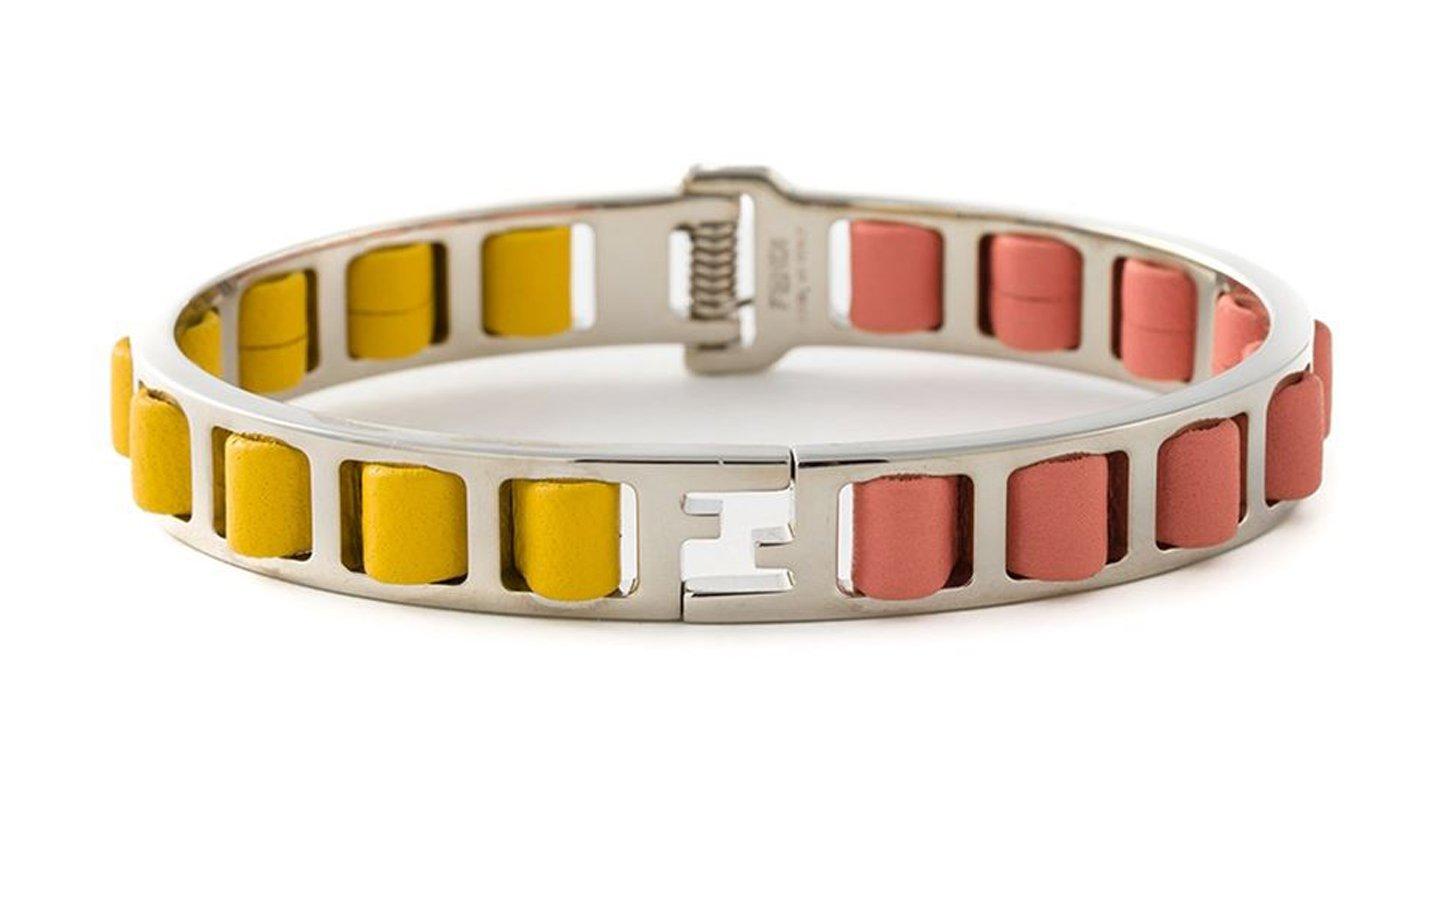 Fendi 'The Fendista' bangle Pink and Yellow Calfskin Leather Metal Bangle Bracelet